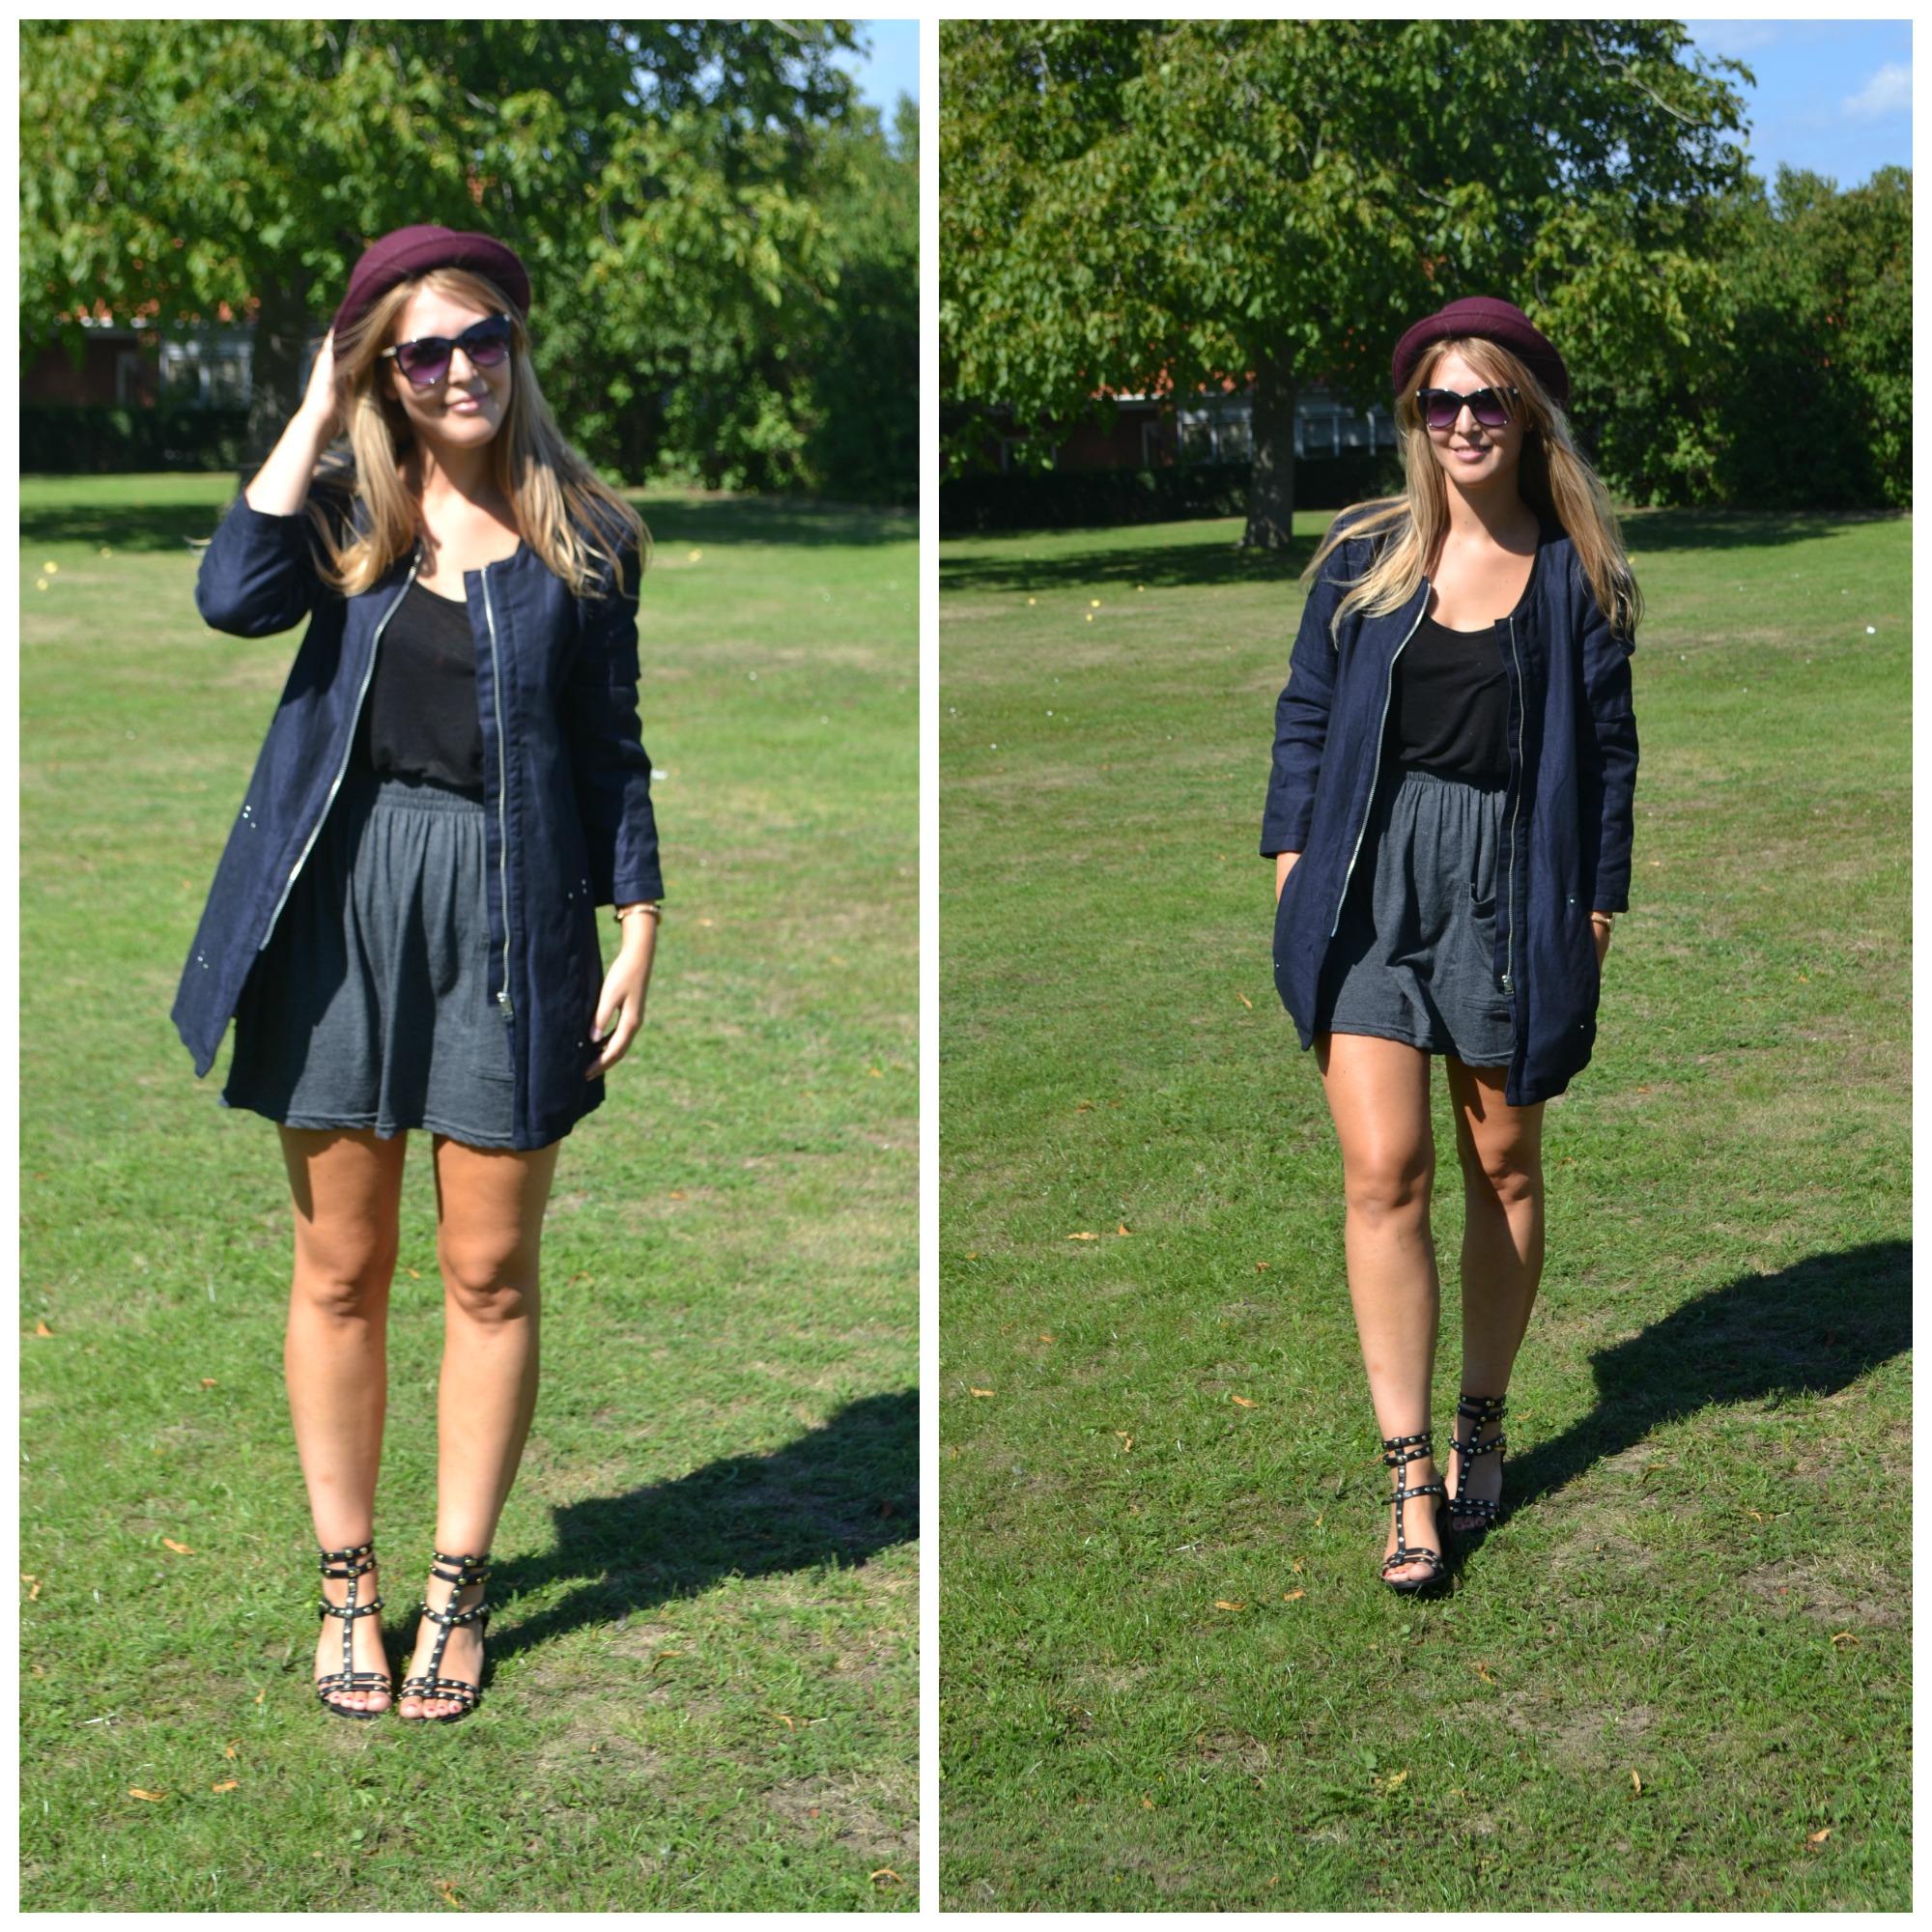 1f6efcc7a7fa Outfit description  skirt  American Apparel    top  Calvin Klein    coat